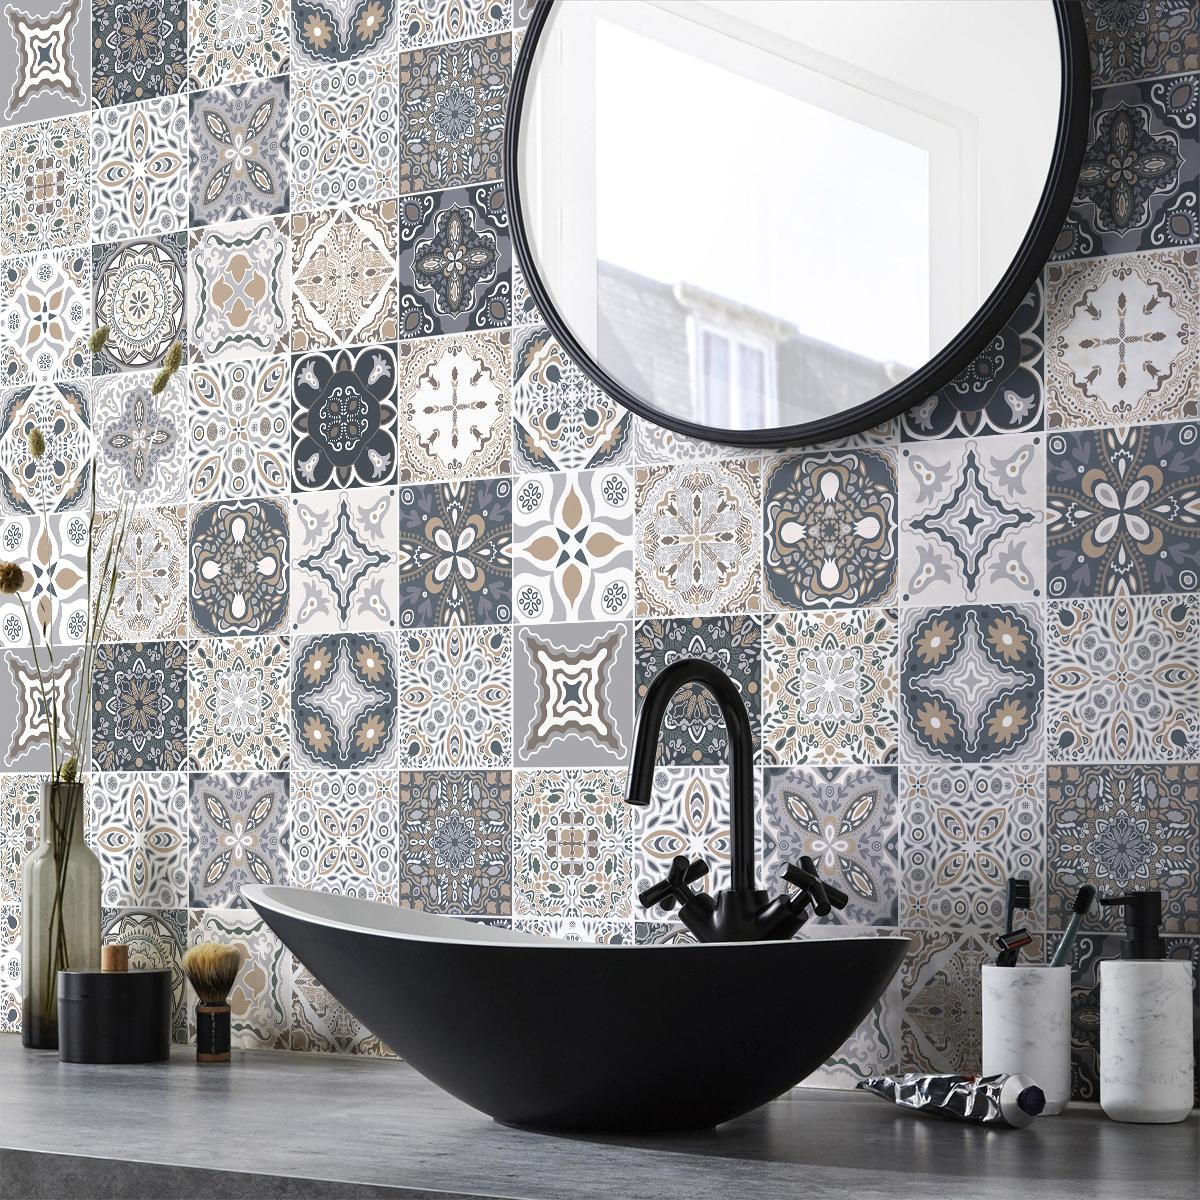 9 stickers carreaux de ciment azulejos orfeo cuisine carrelages ambiance sticker. Black Bedroom Furniture Sets. Home Design Ideas